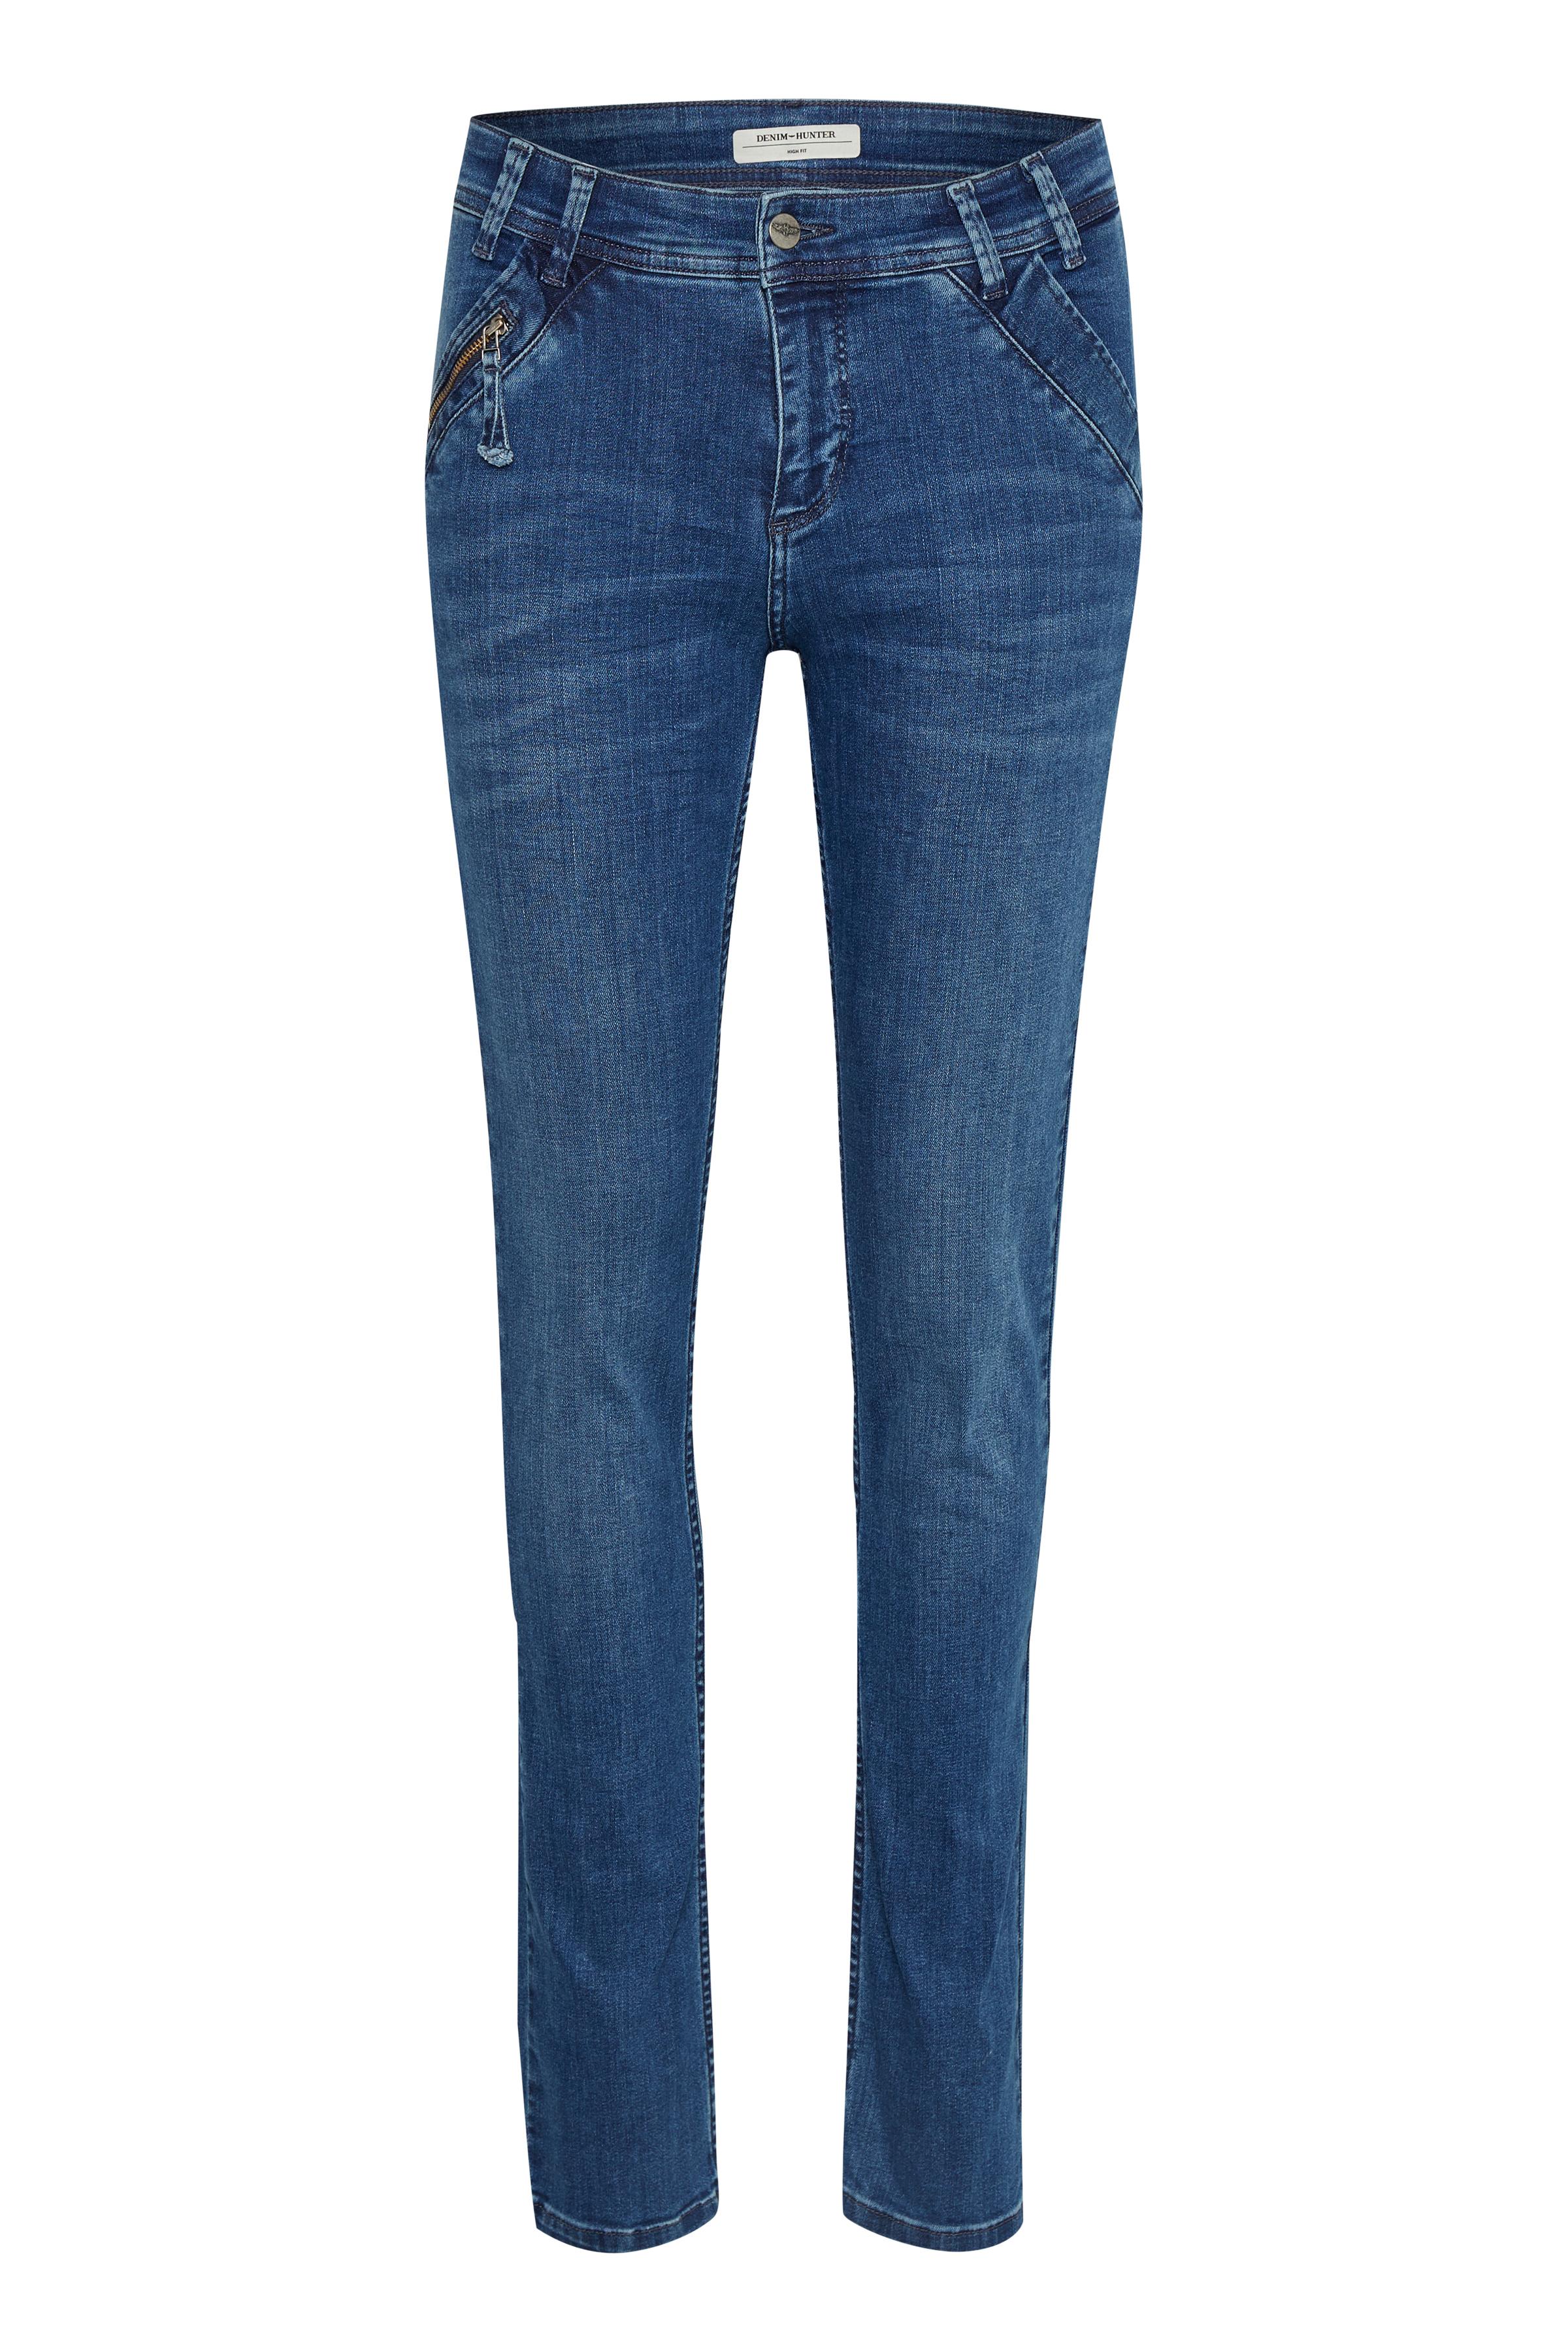 Image of Denim Hunter Dame Cape High jeans - Denimblå